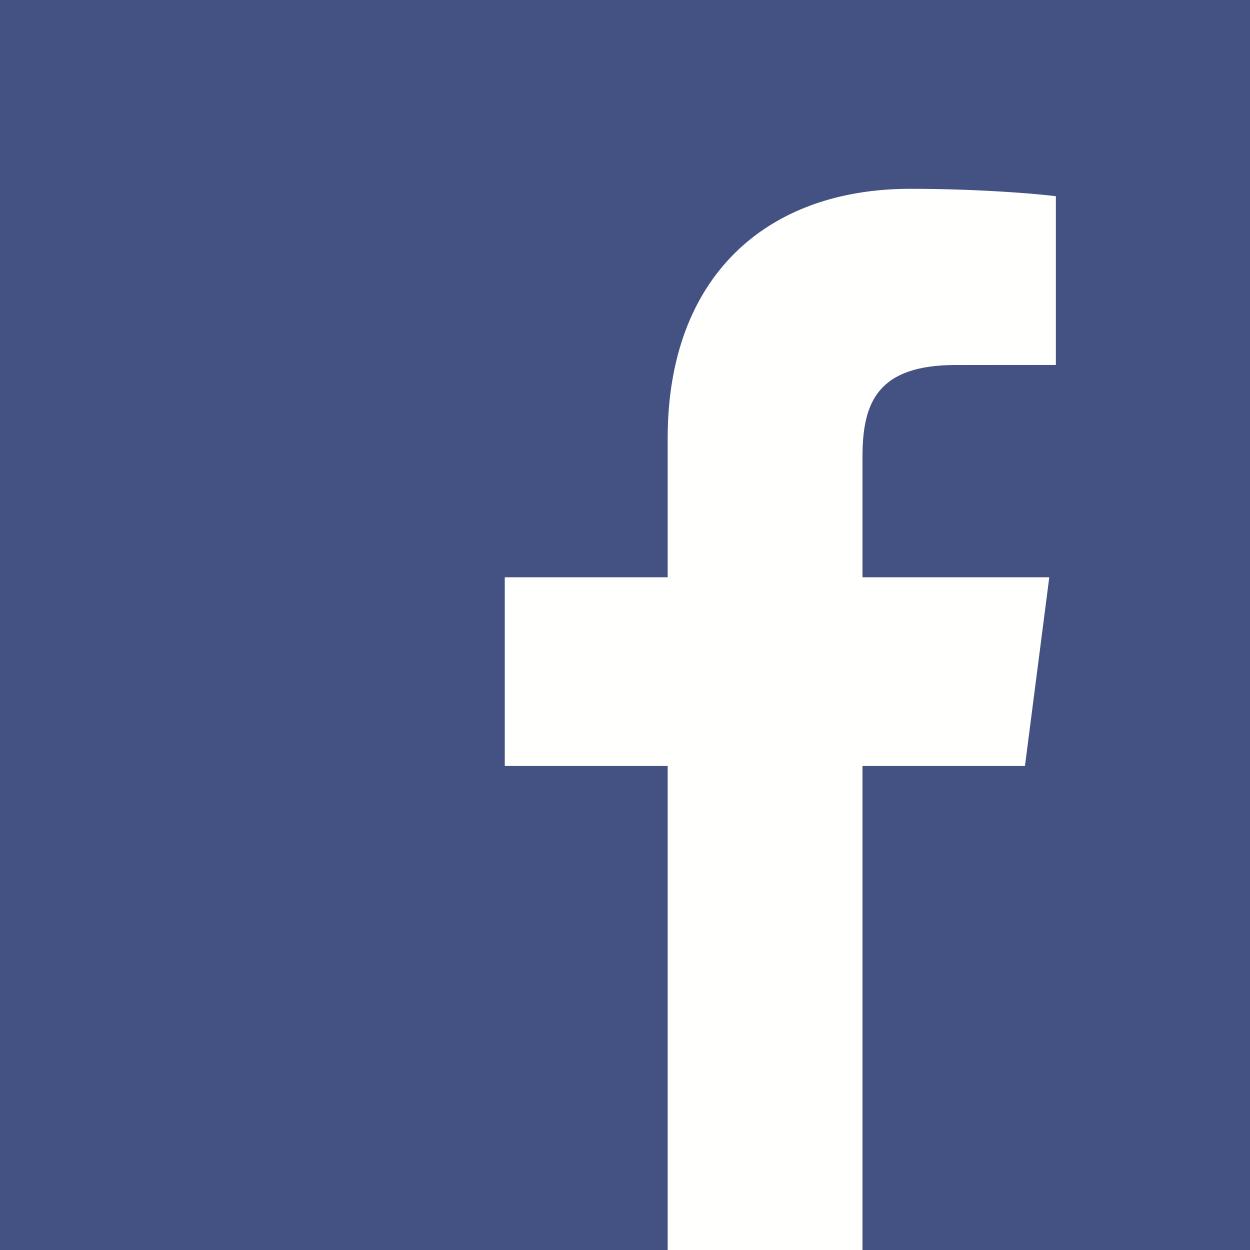 logo-facebook-40.png